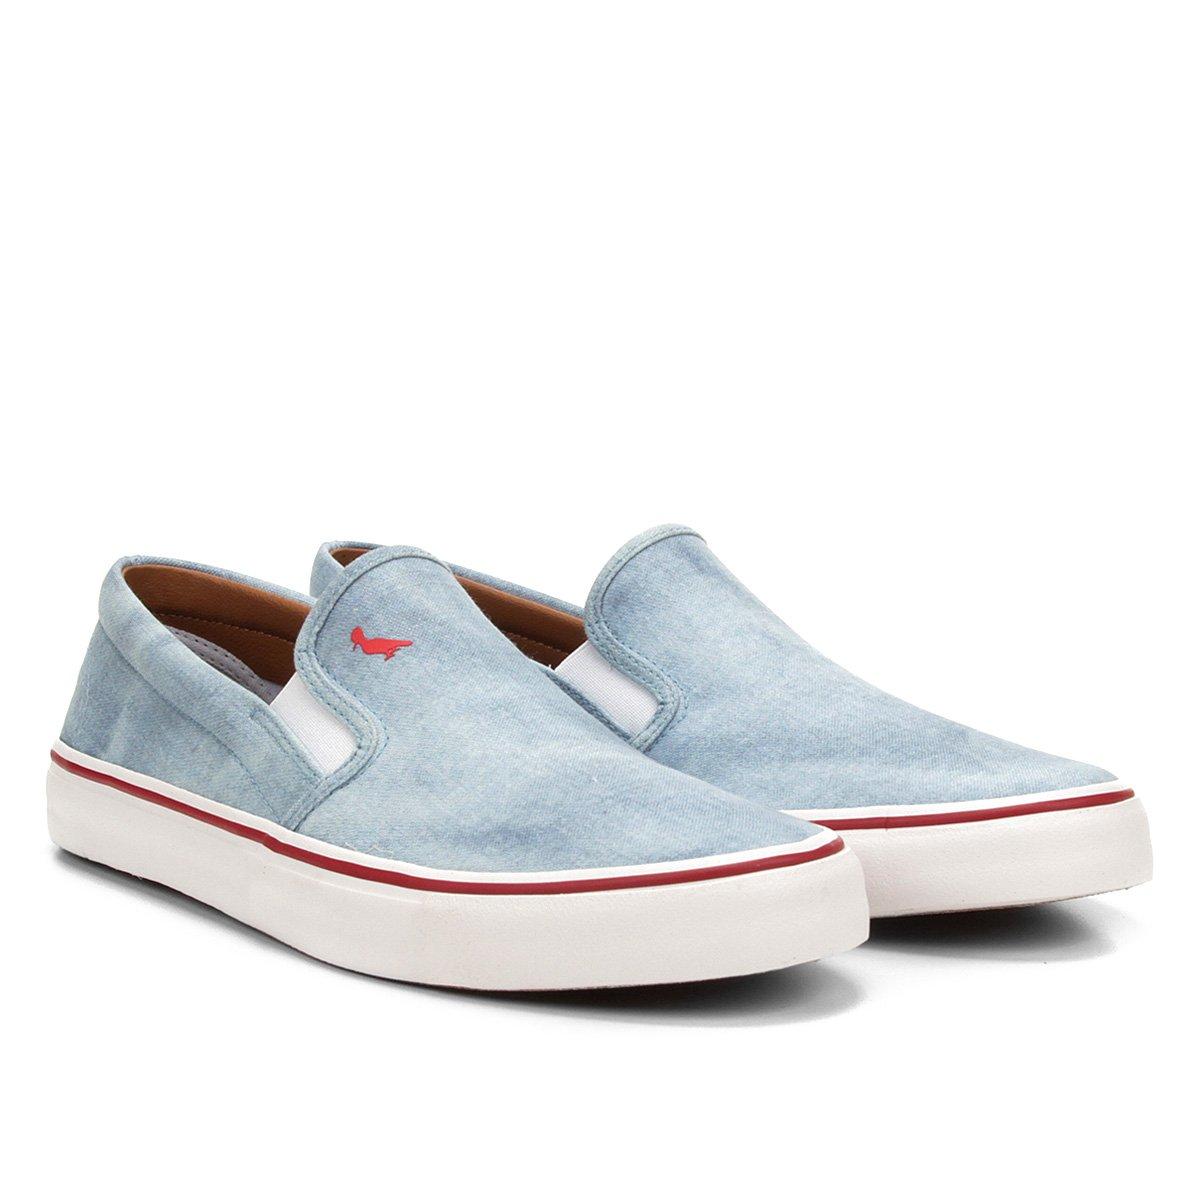 Slip Jeans On Reserva Jeans Slip Básico Masculino Compre Agora Netsapatos 661c56